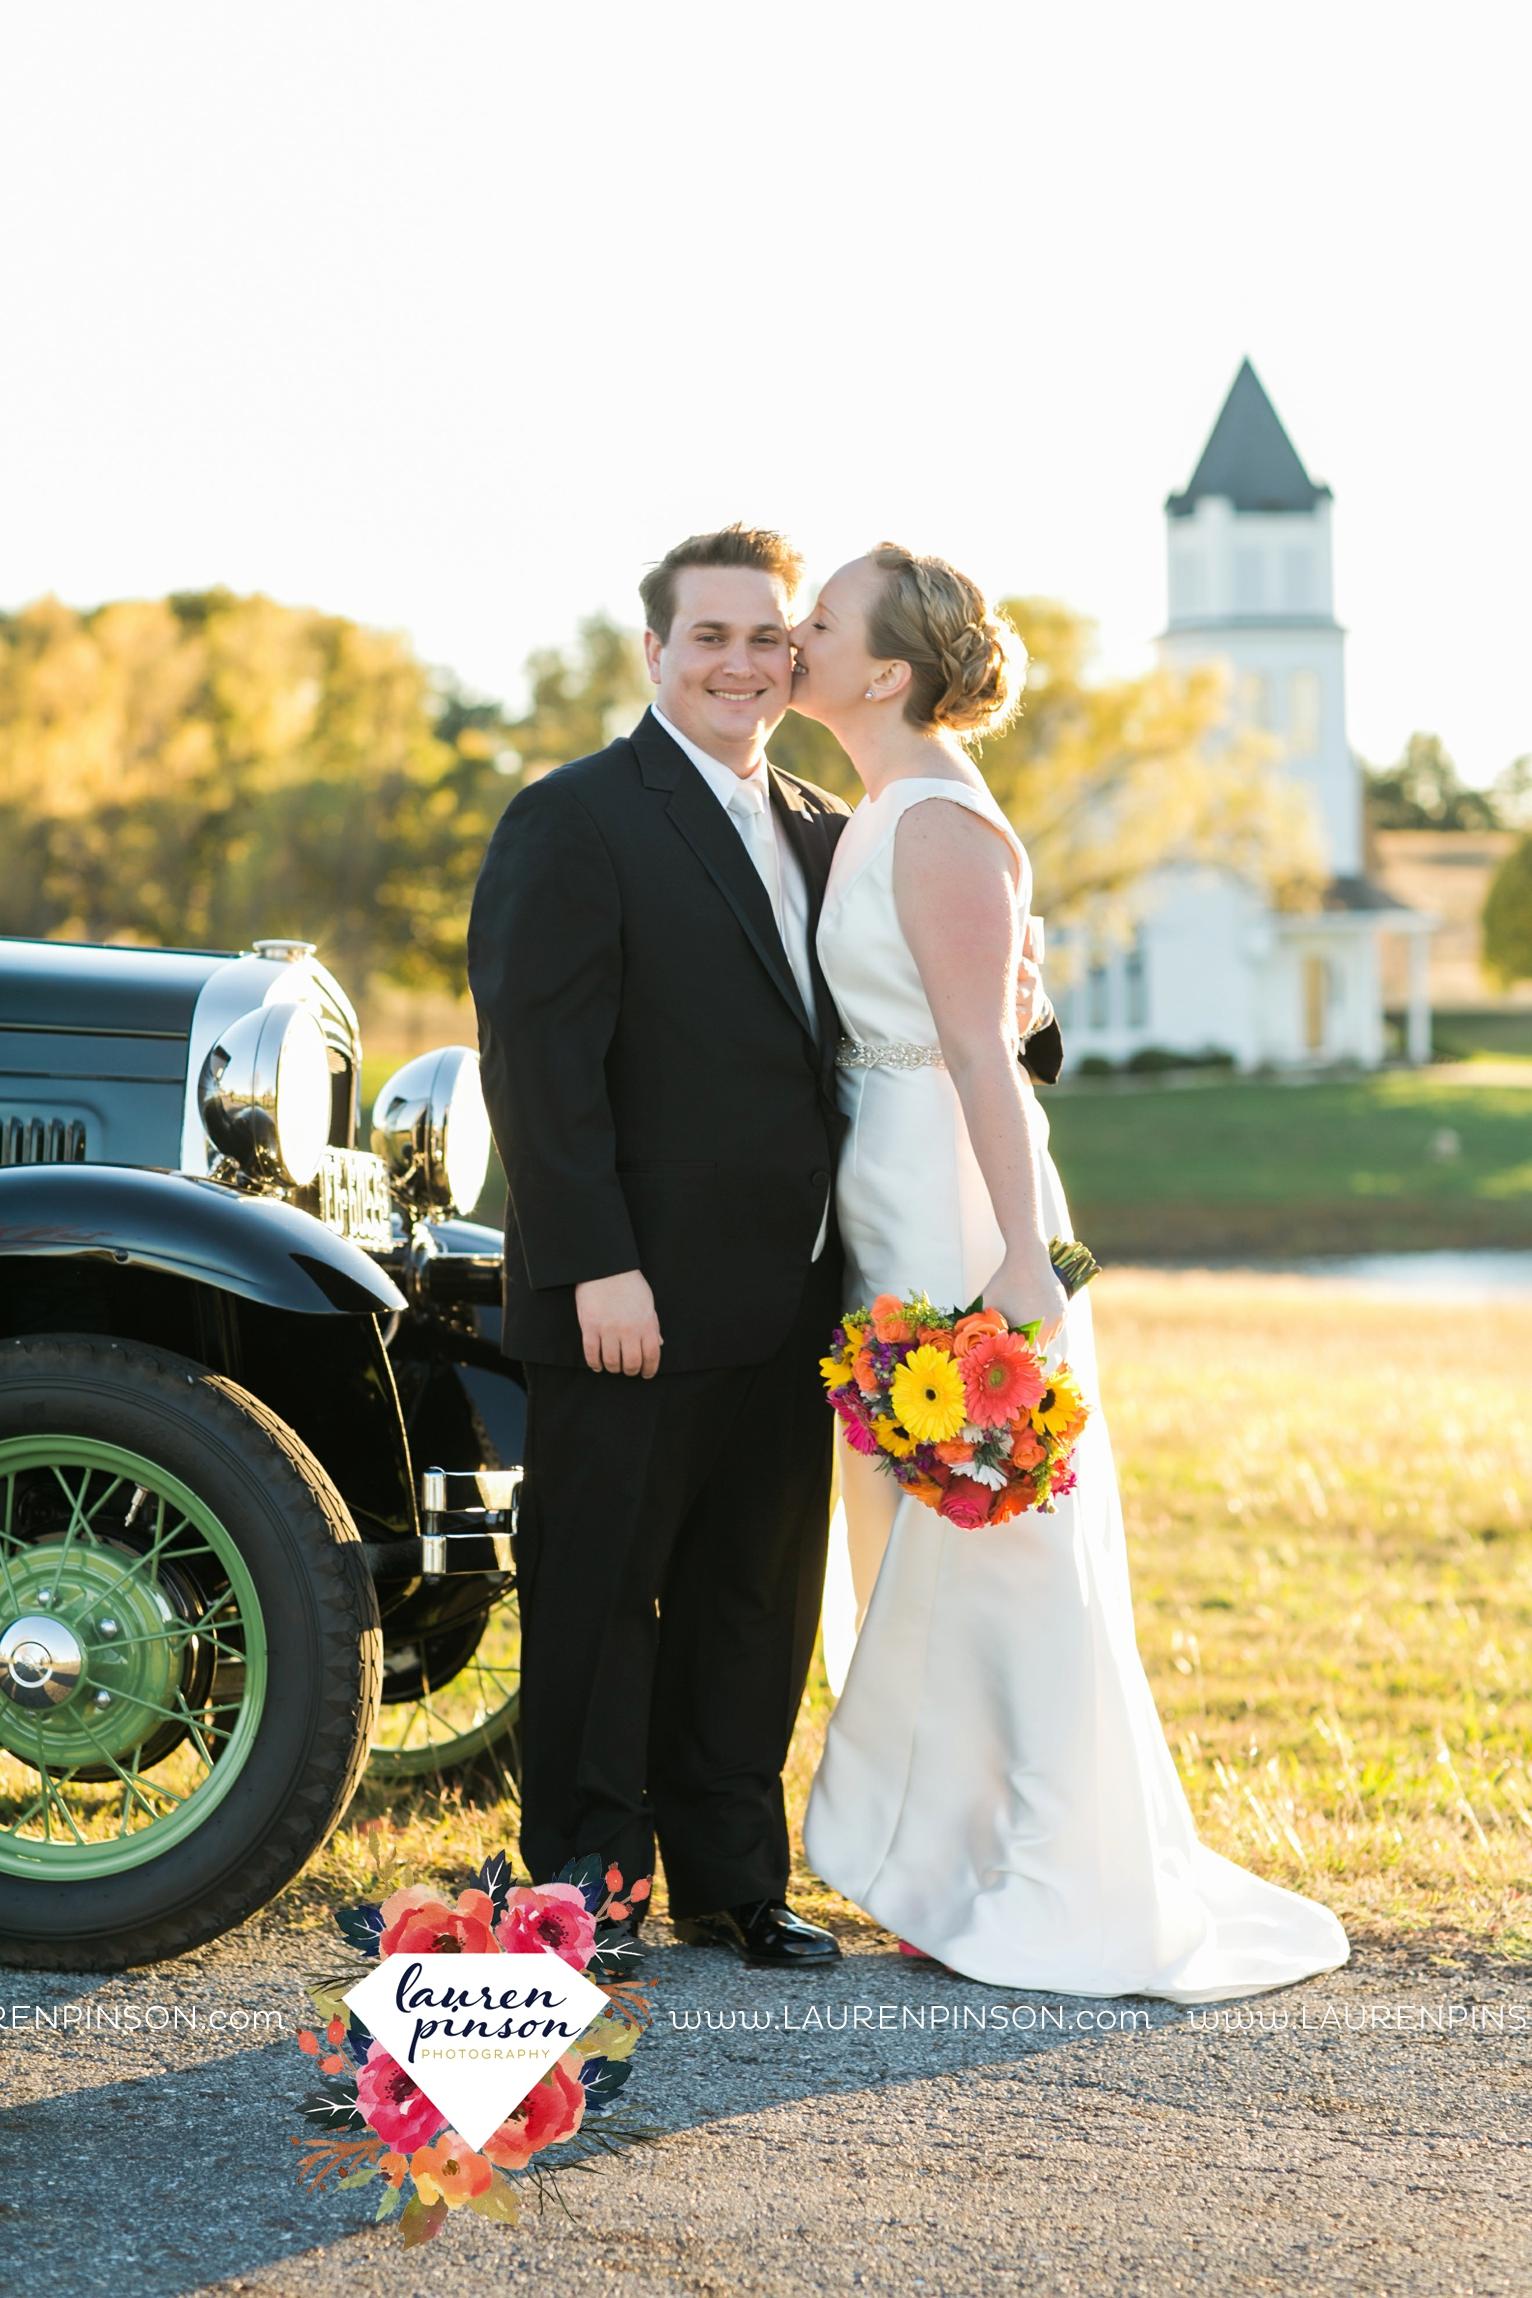 bells-texas-wedding-photography-at-willowood-ranch-chapel-north-texas-wichita-falls-wedding-photographer_1849.jpg